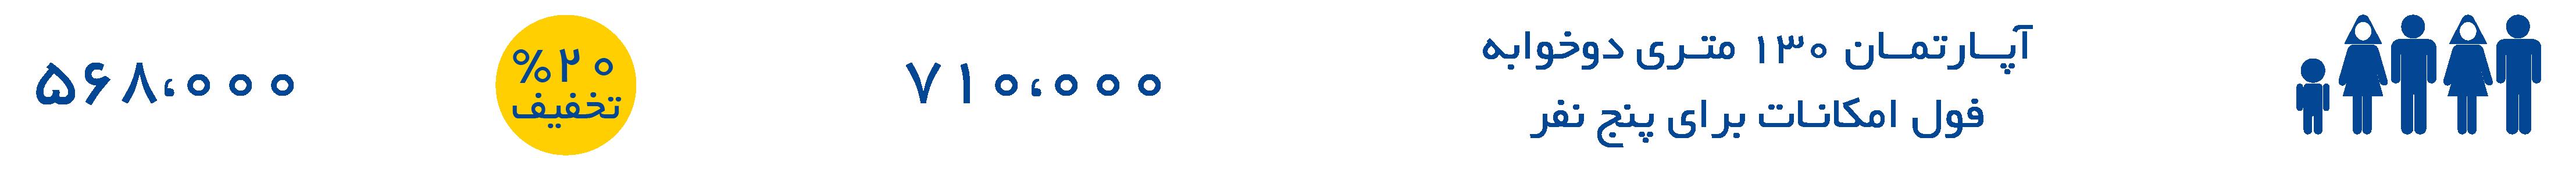 05-person-saran